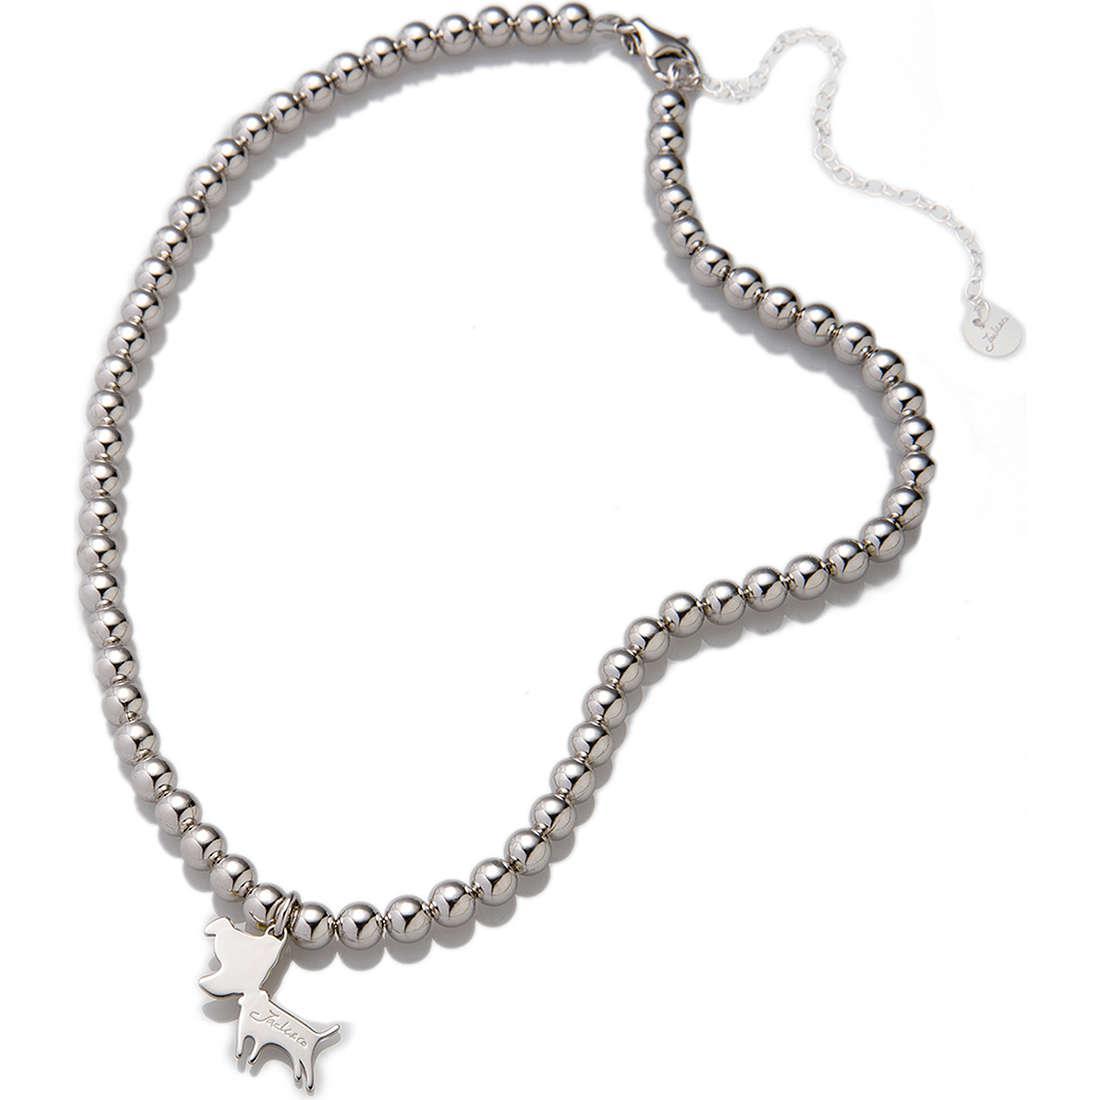 Collier femme bijoux jackco jcn0194